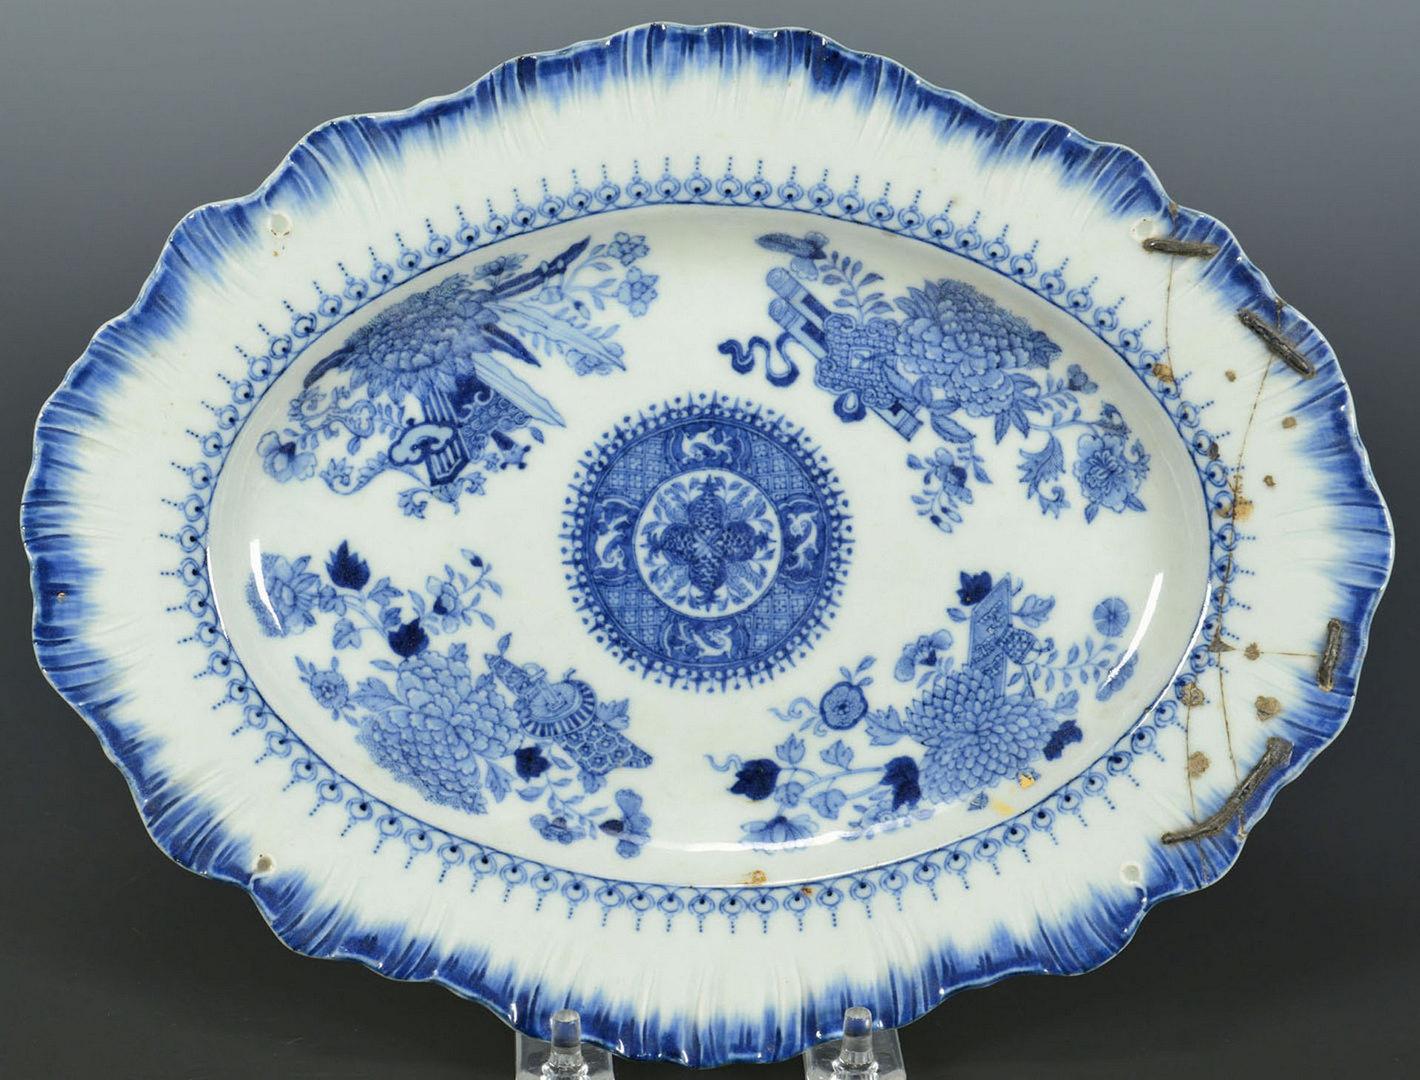 Lot 230: 18 pcs assorted Fitzhugh Chinese Export porcelain